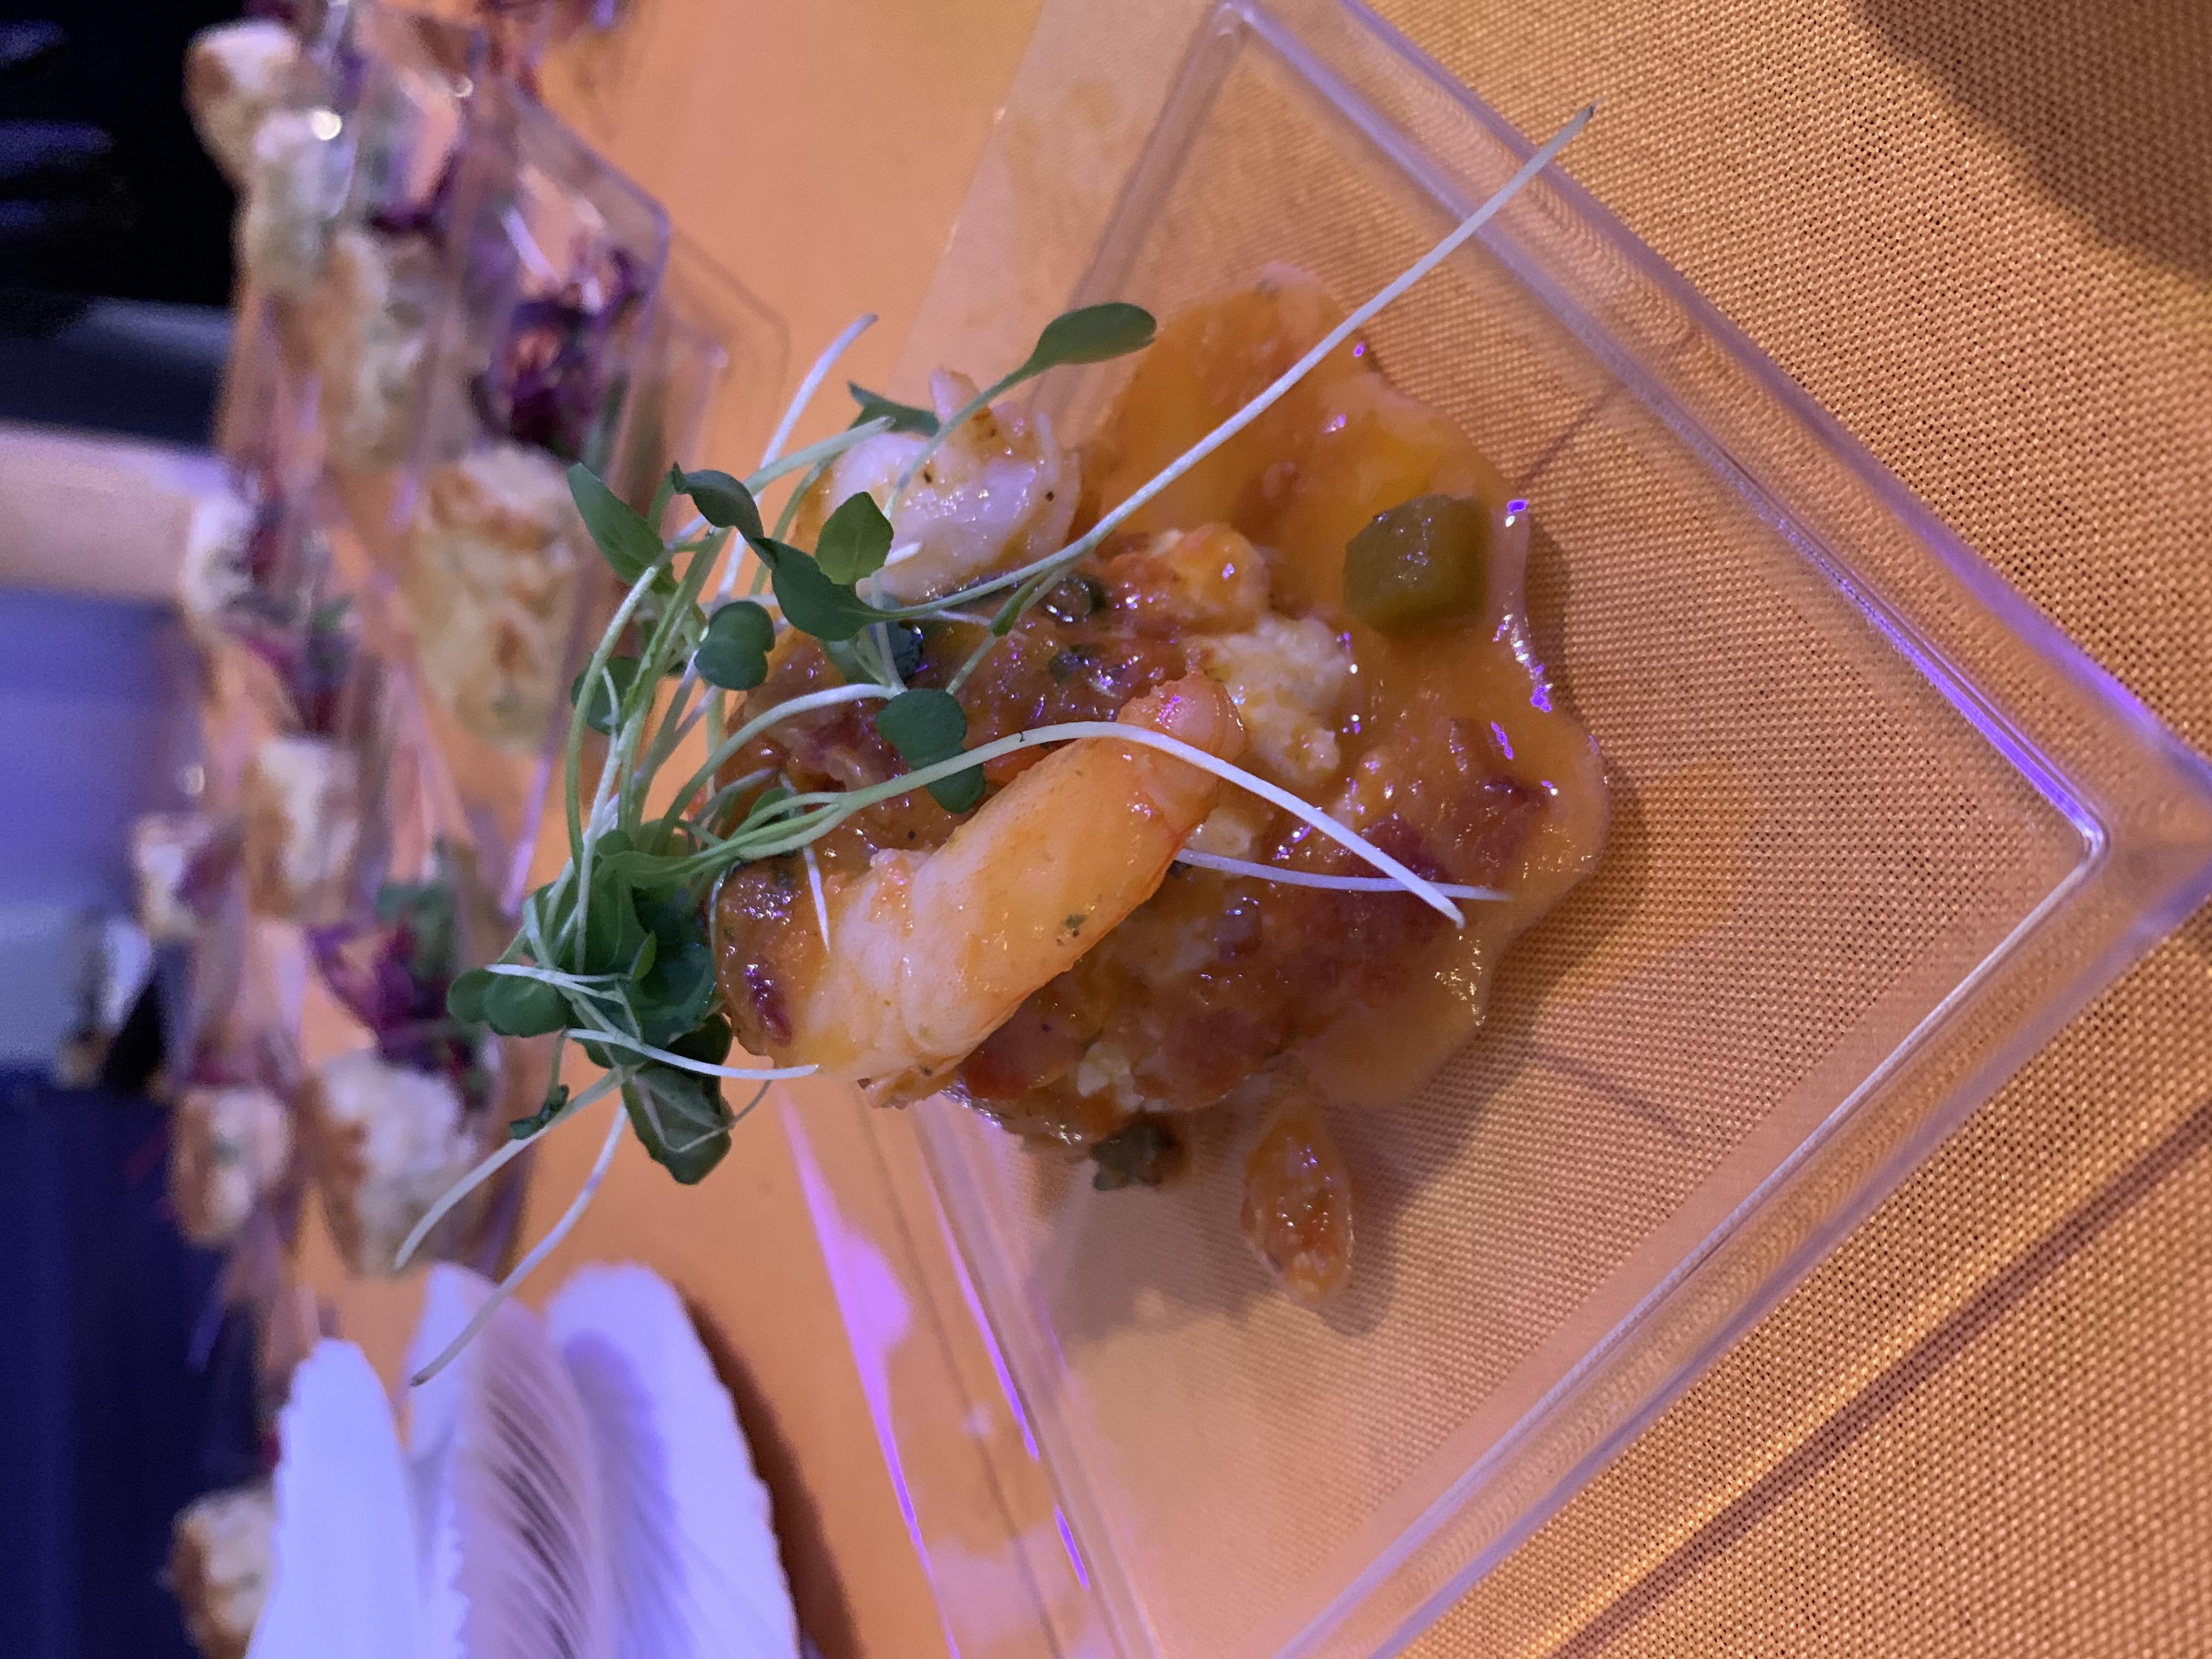 Chili Shrimp &Creamy Gouda Grits